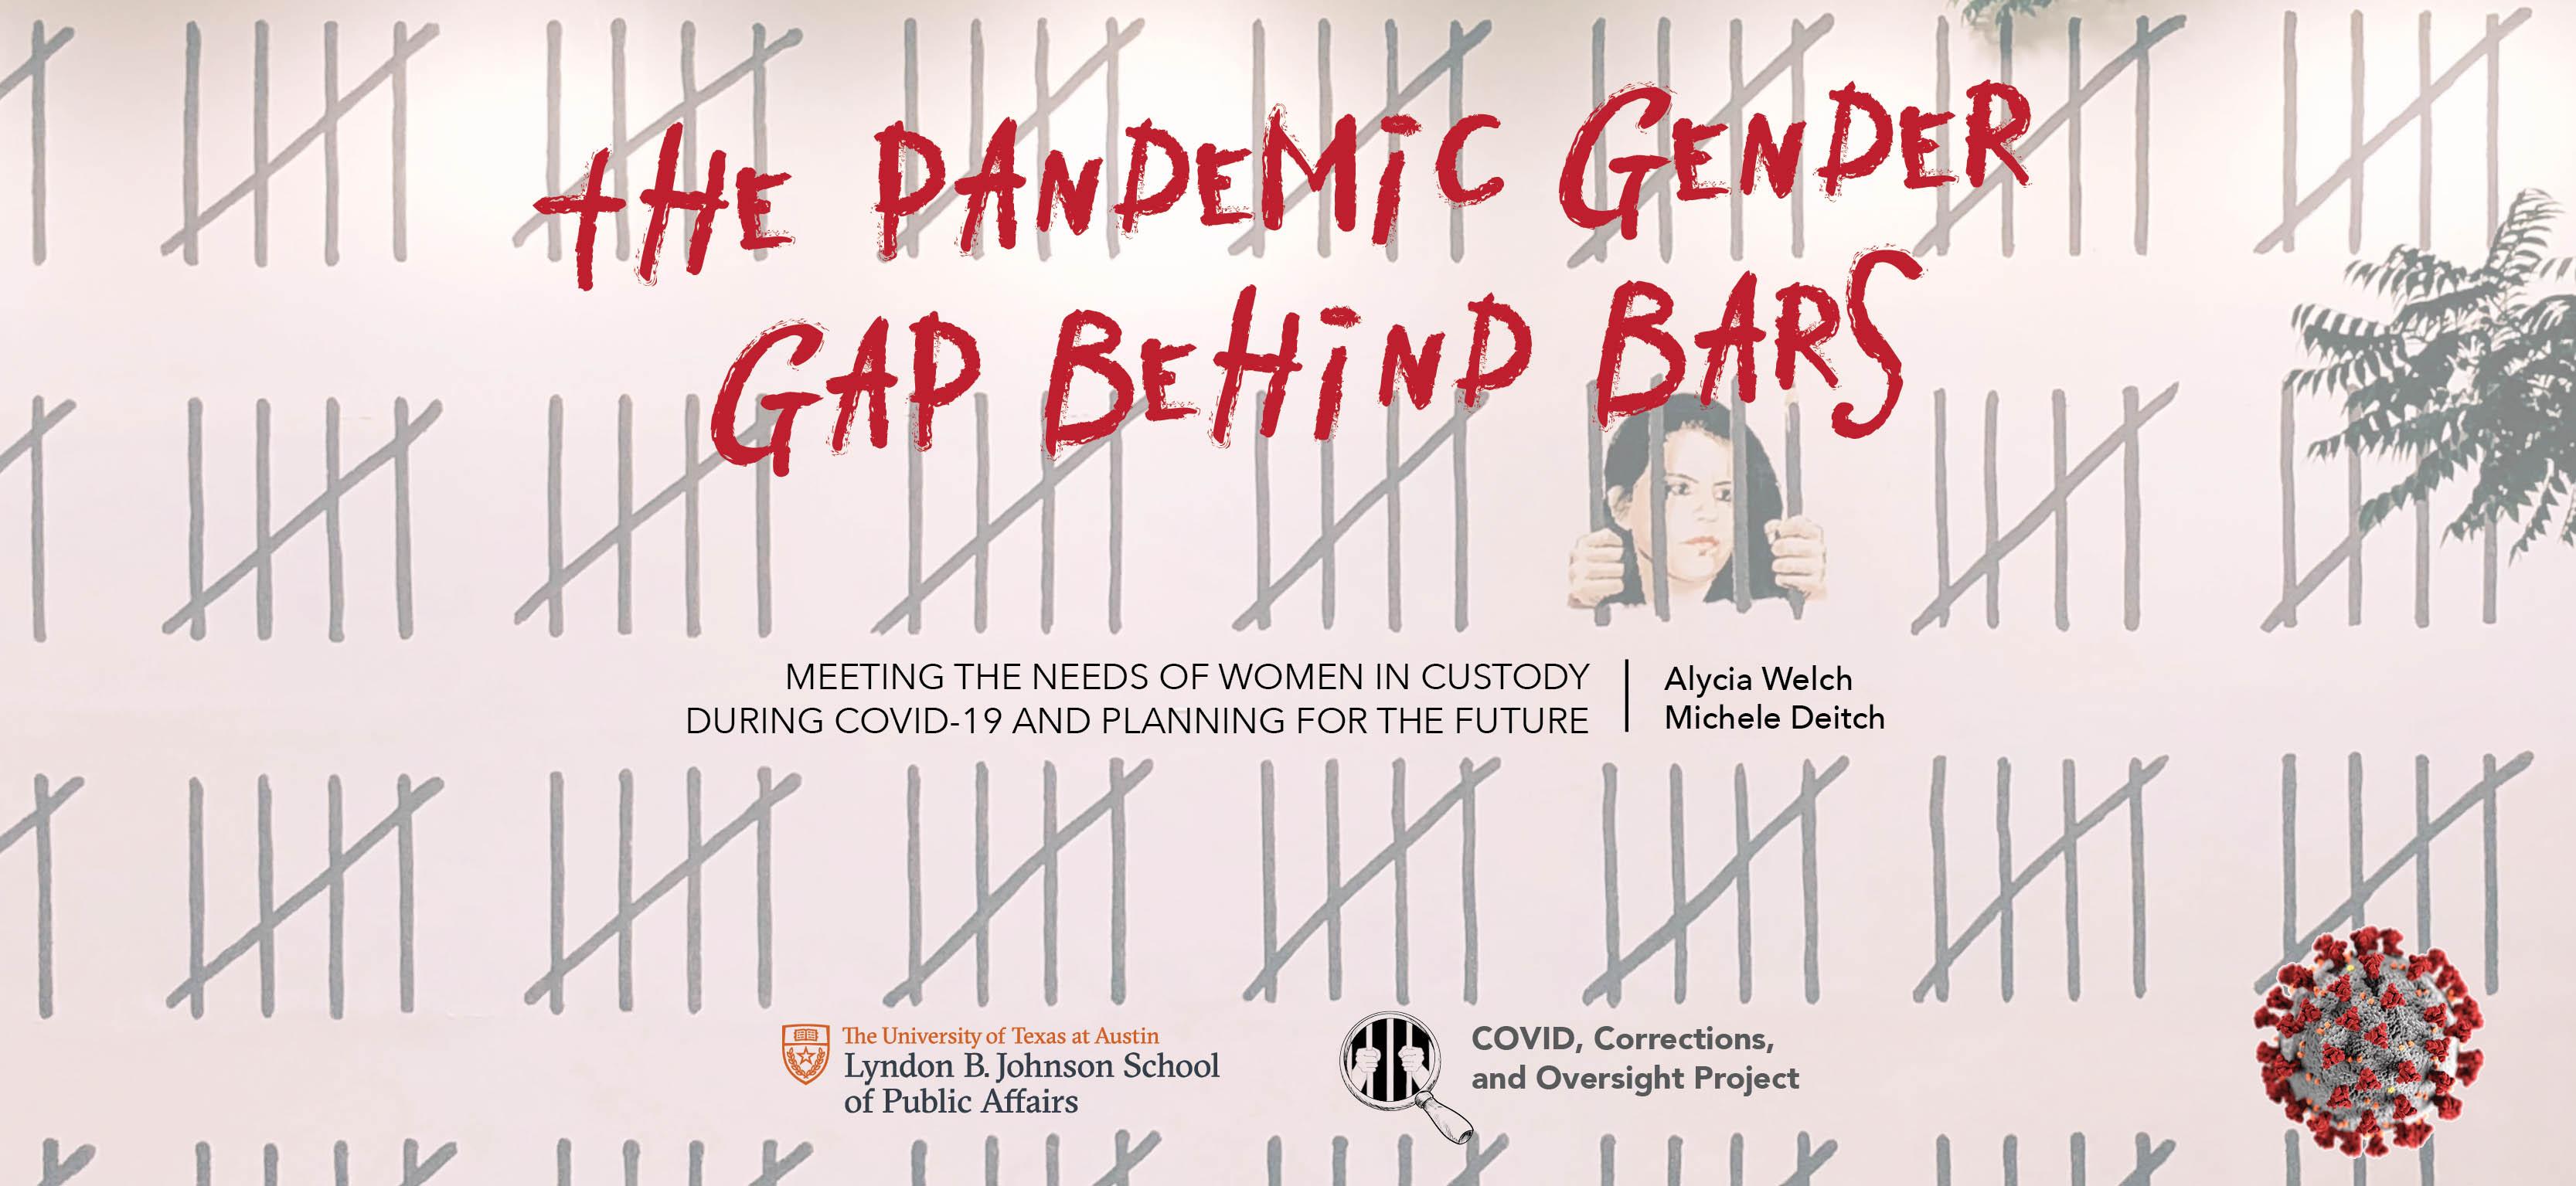 The Pandemic Gender Gap Behind Bars by Alycia Welch, Michele Deitch